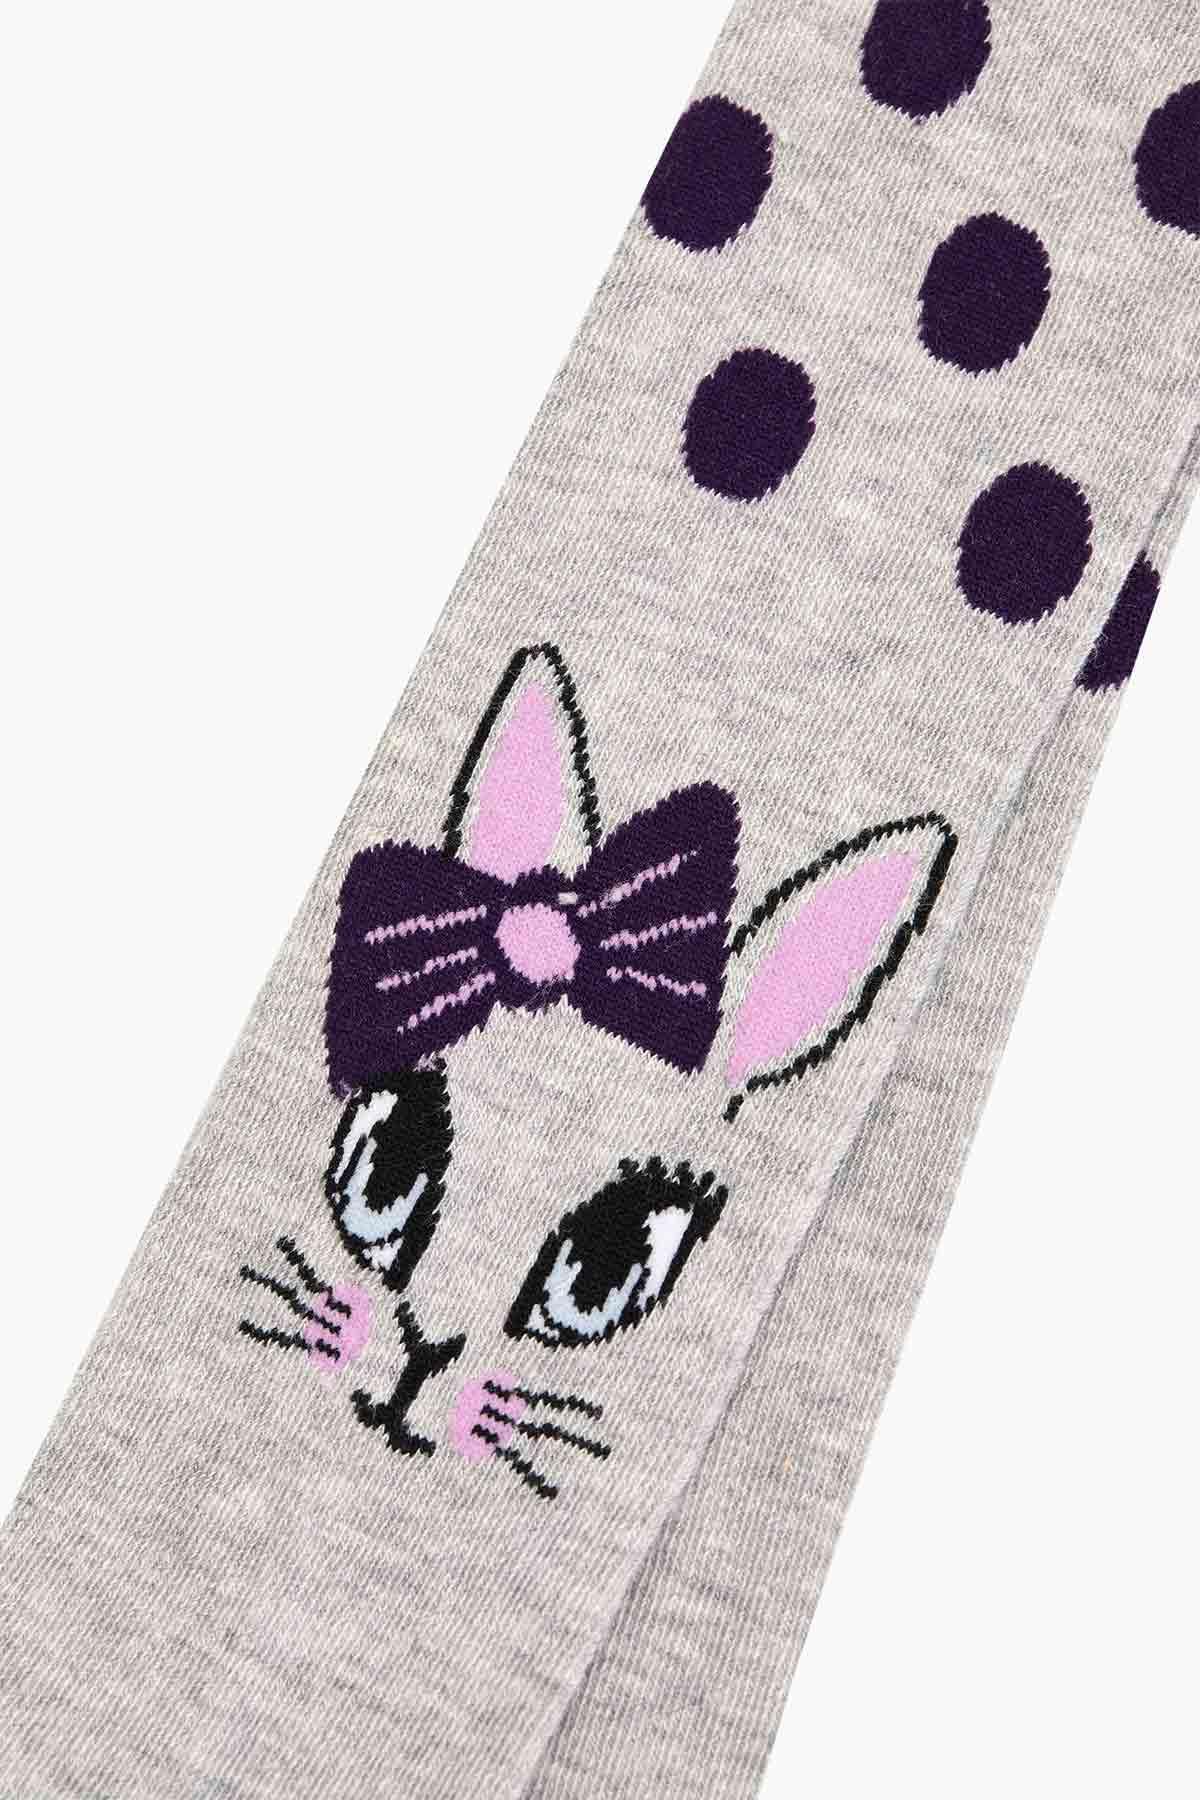 Puanlı Kedi Desenli Çocuk Külotlu Çorap - Thumbnail